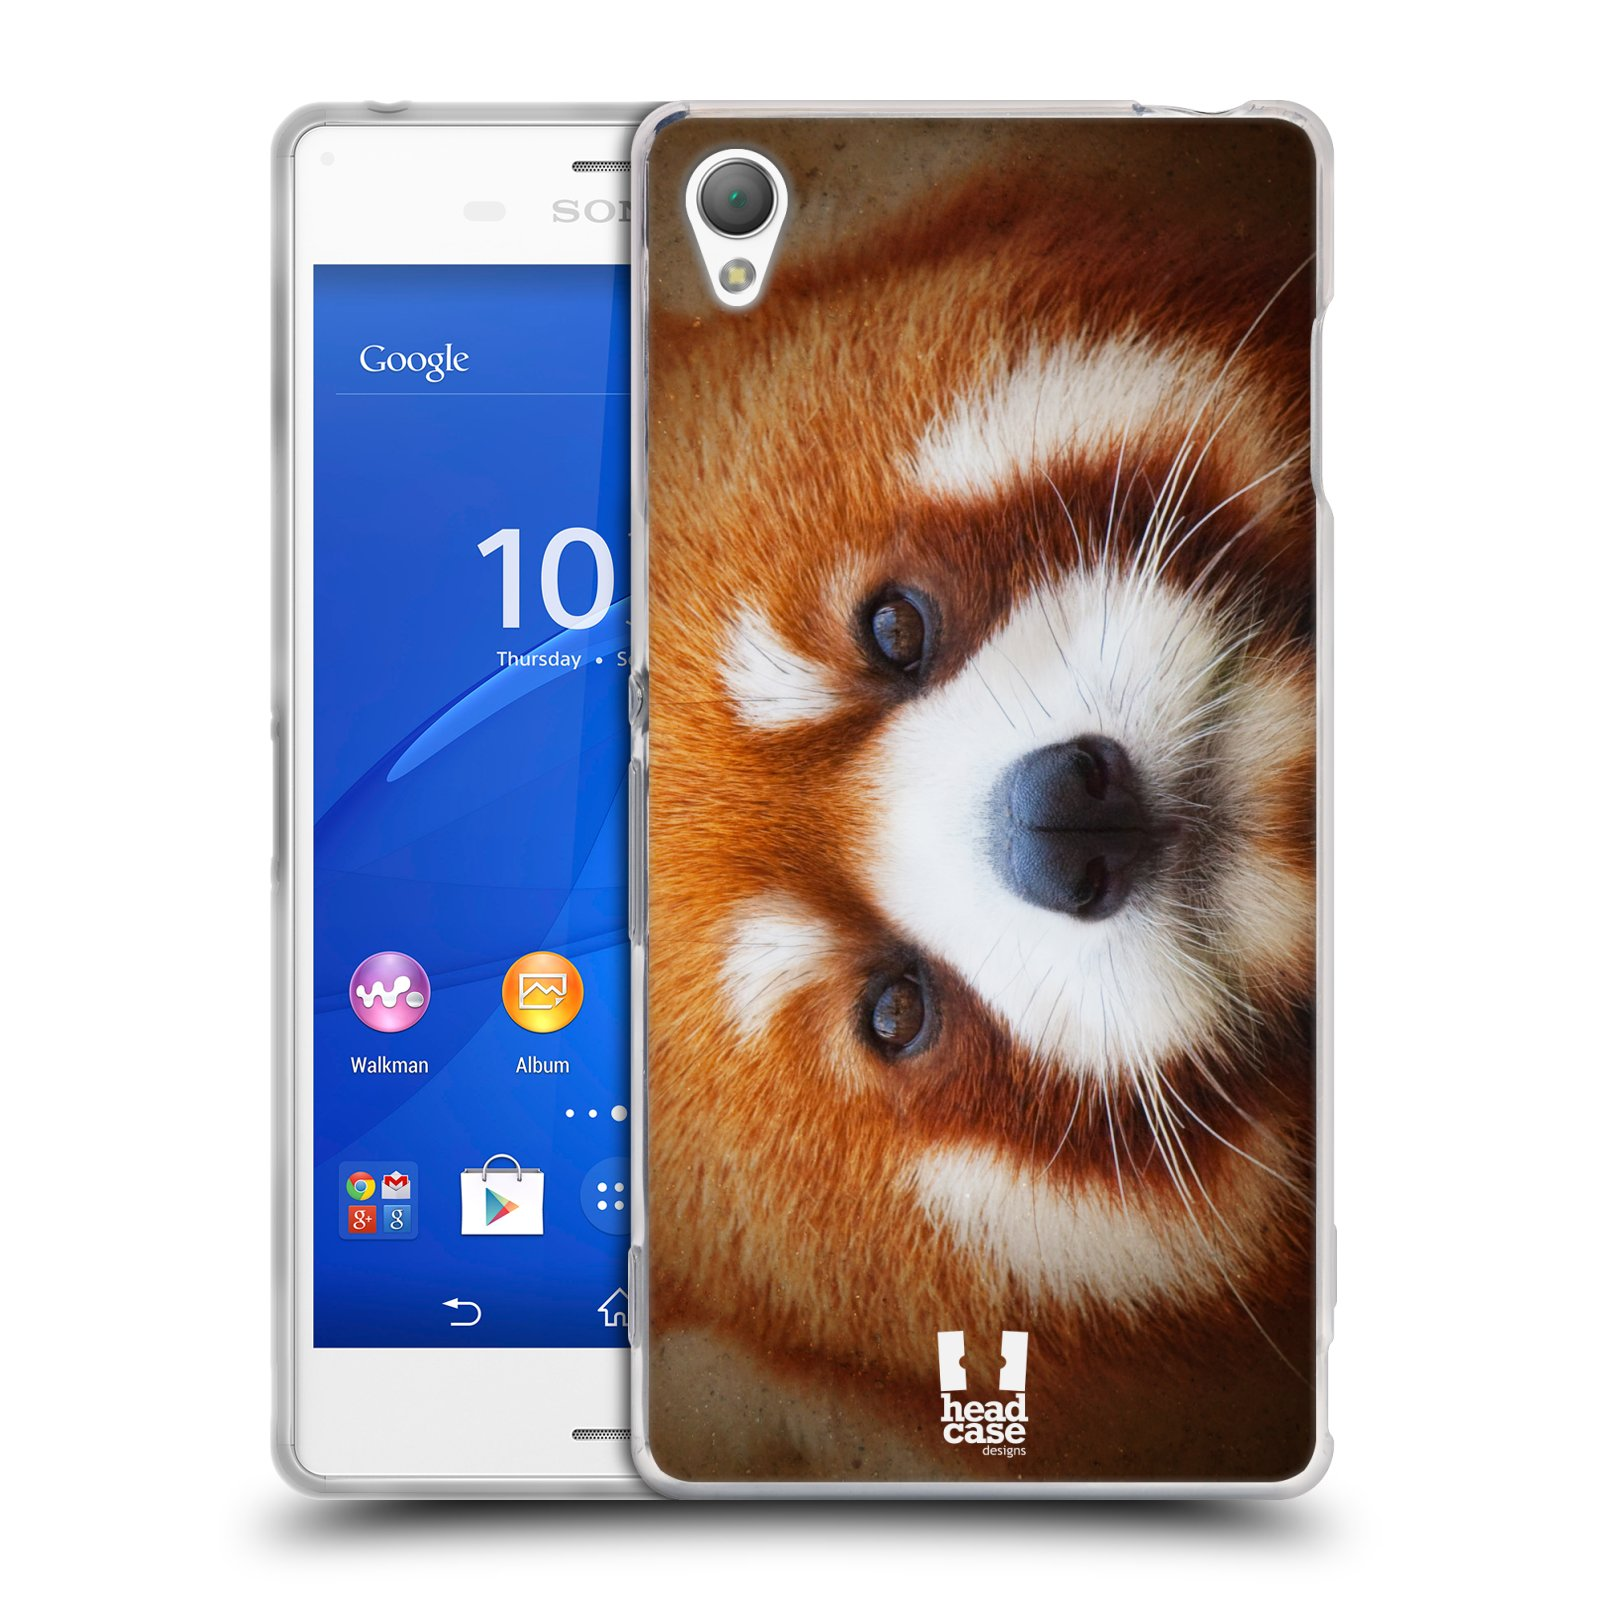 HEAD CASE silikonový obal na mobil Sony Xperia Z3 vzor Zvířecí tváře 2 medvěd panda rudá